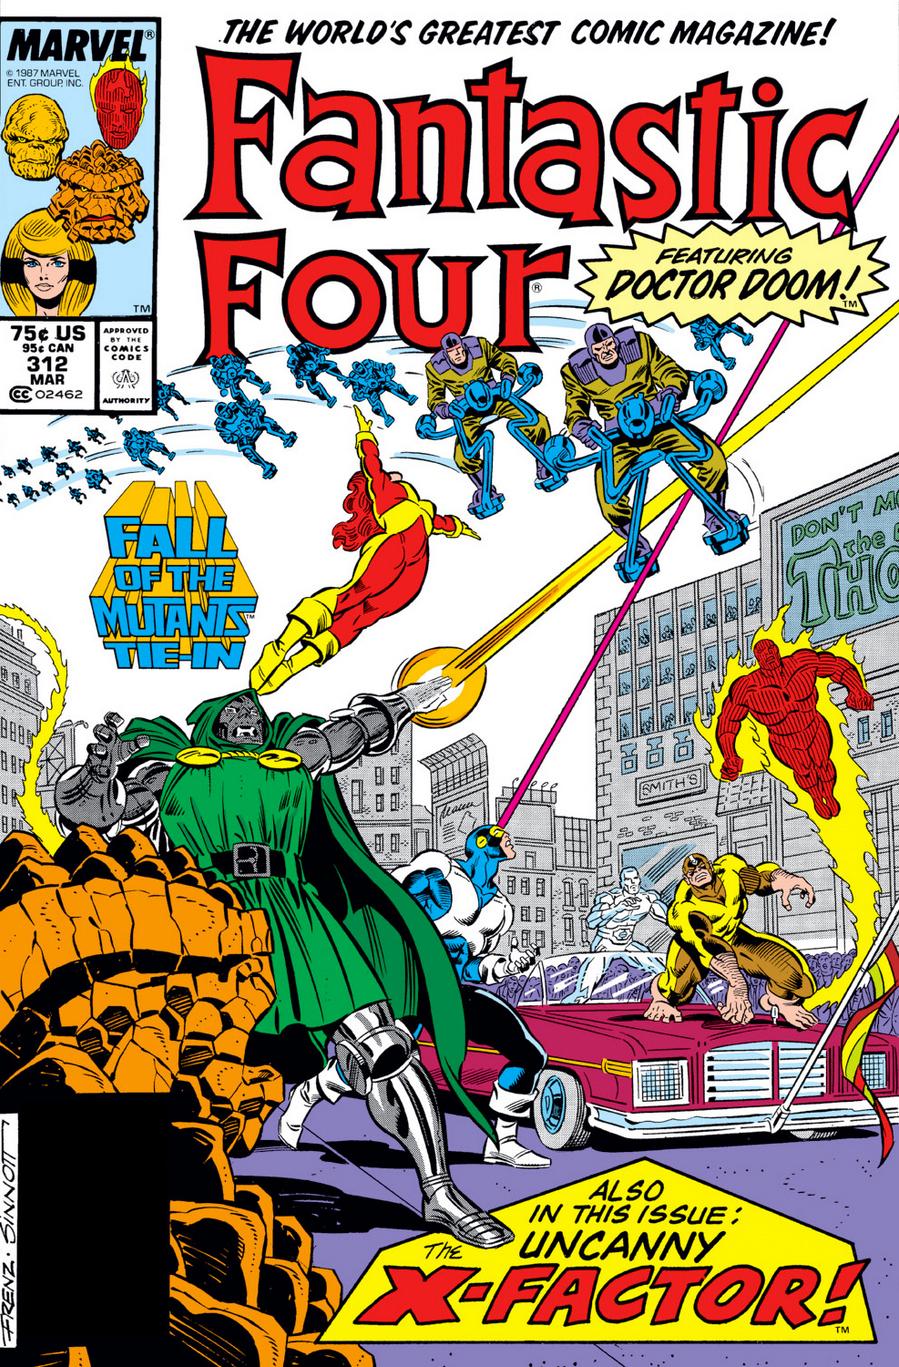 Fantastic Four (1961) #312